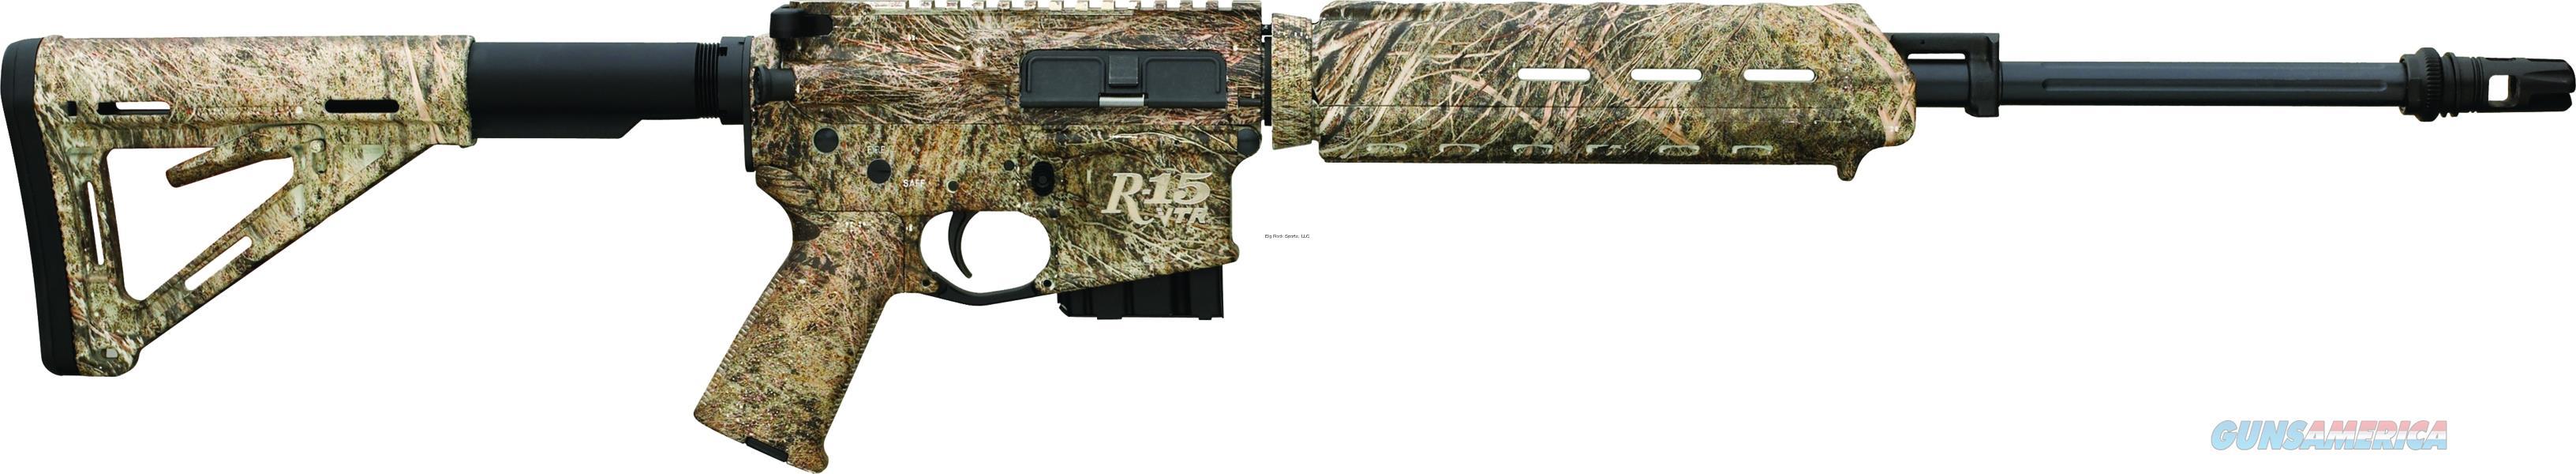 Remington R-15 Predator 223Rem 22 Magpul Moe Mobr 5Rd 60011  Guns > Rifles > R Misc Rifles